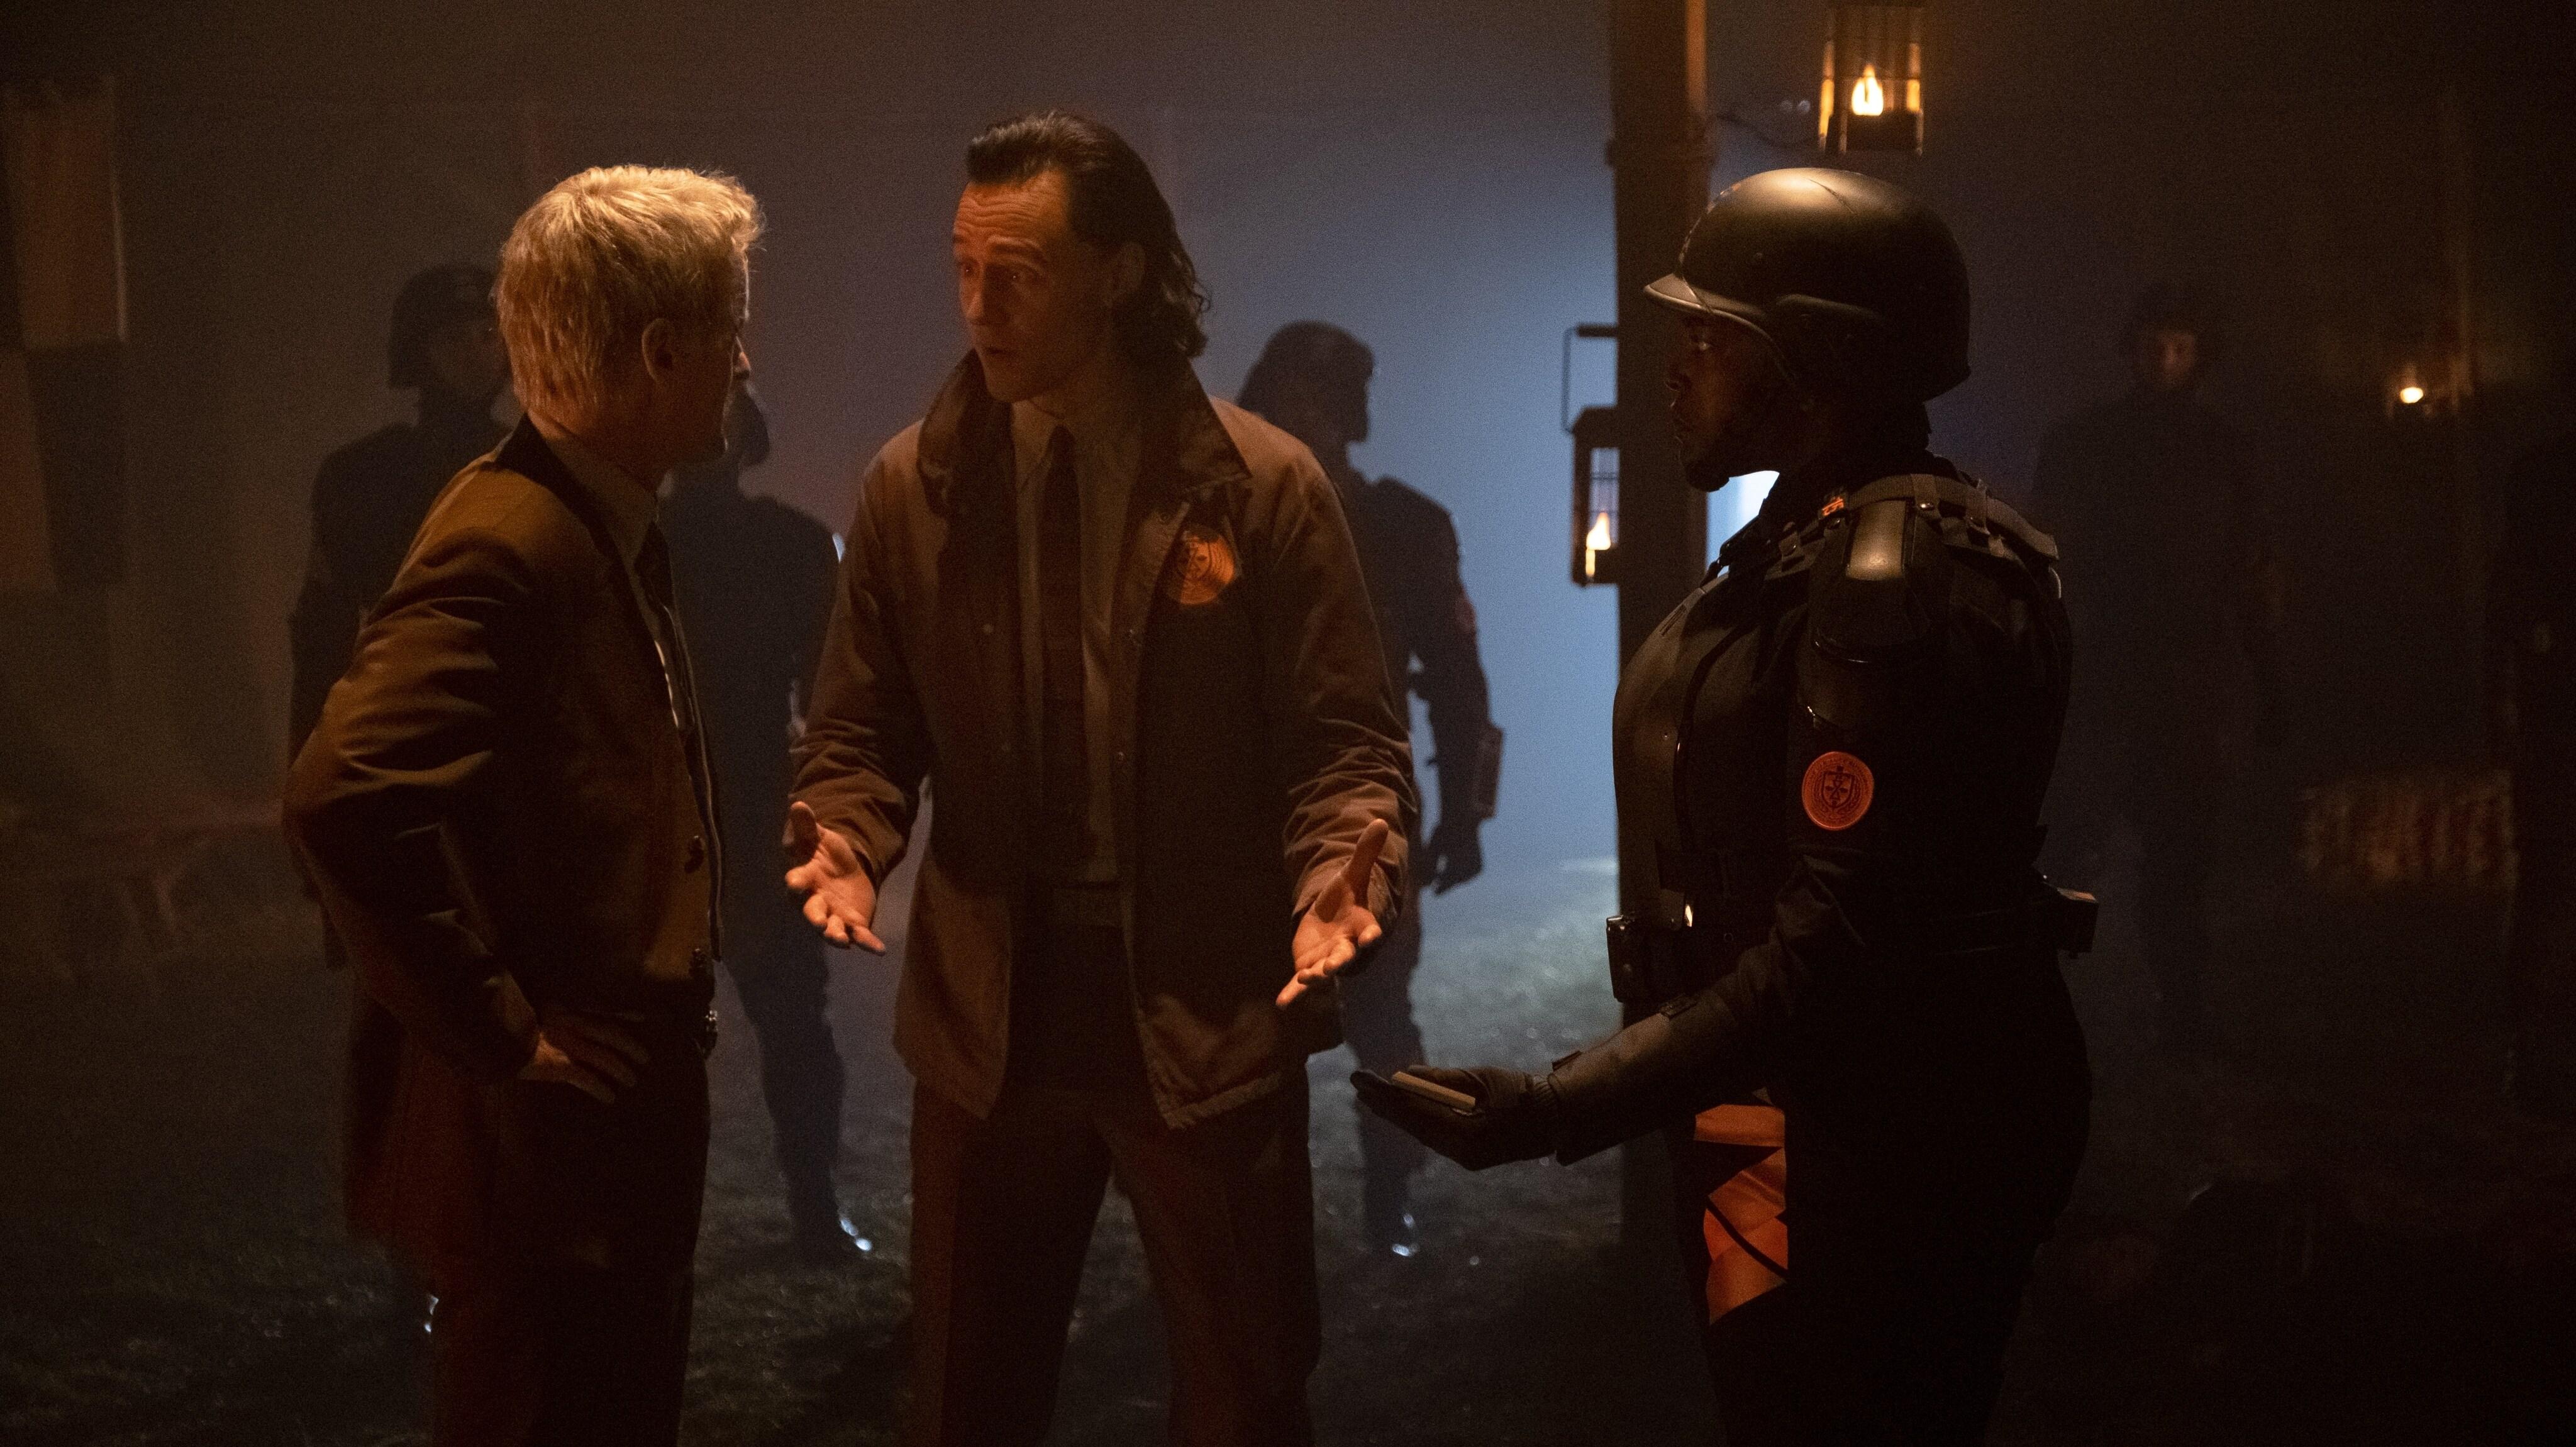 (L-R): Mobius (Owen Wilson), Loki (TomHiddleston) and Hunter B-15 (Wunmi Mosaku) in Marvel Studios' LOKI, exclusively on Disney+. Photo by Chuck Zlotnick. ©Marvel Studios 2021. All Rights Reserved.